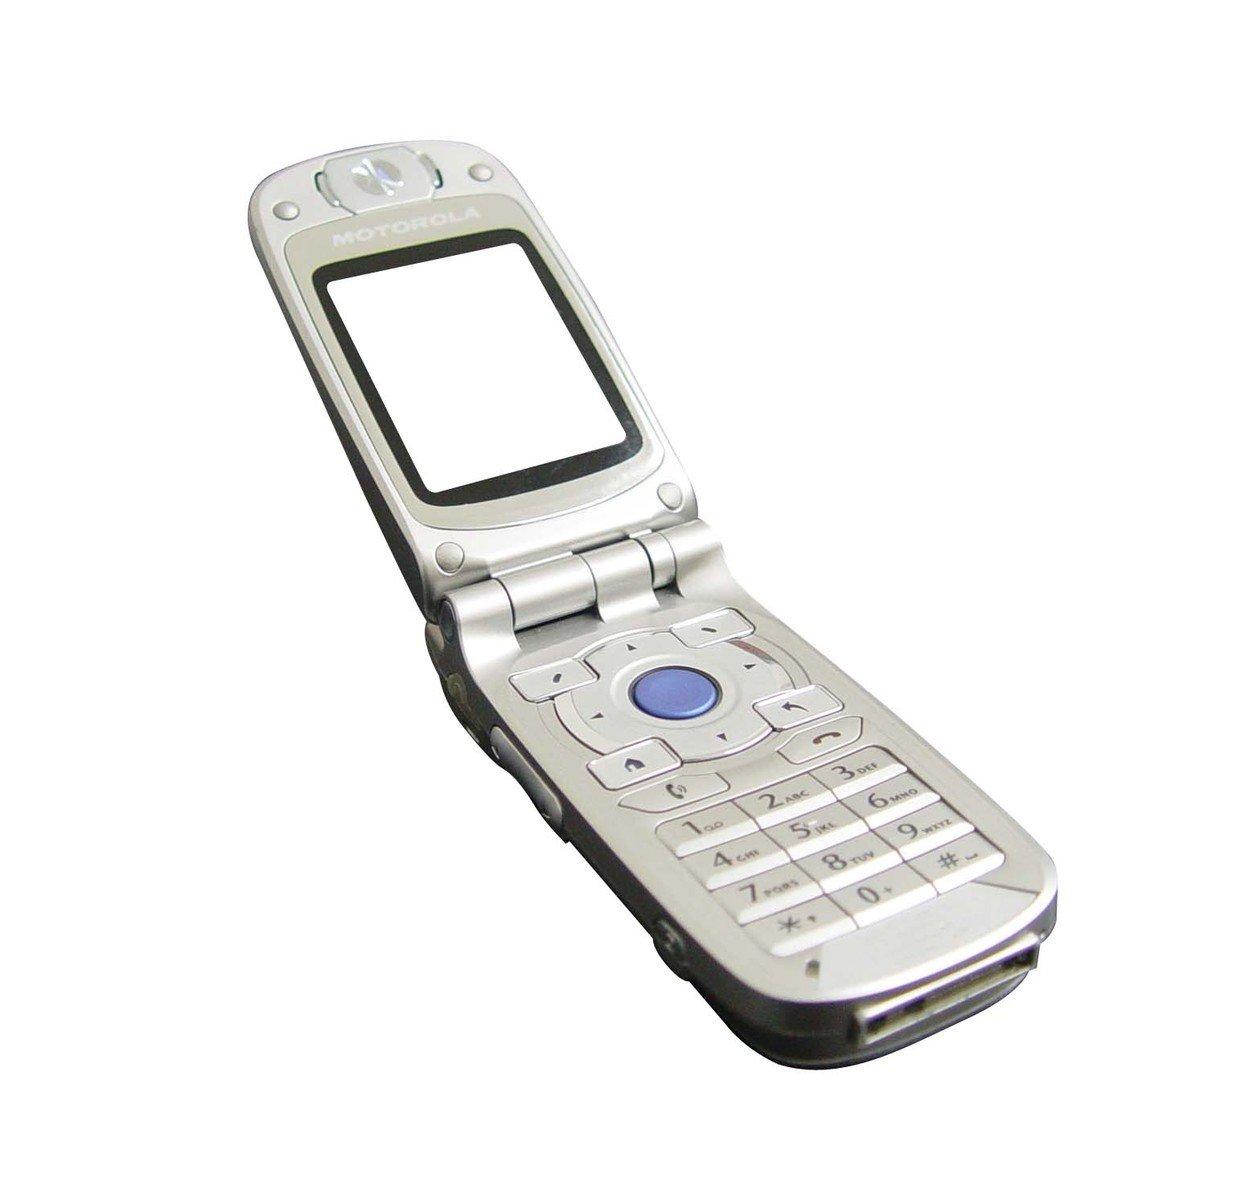 jaki telefon kupić do 2500 zł